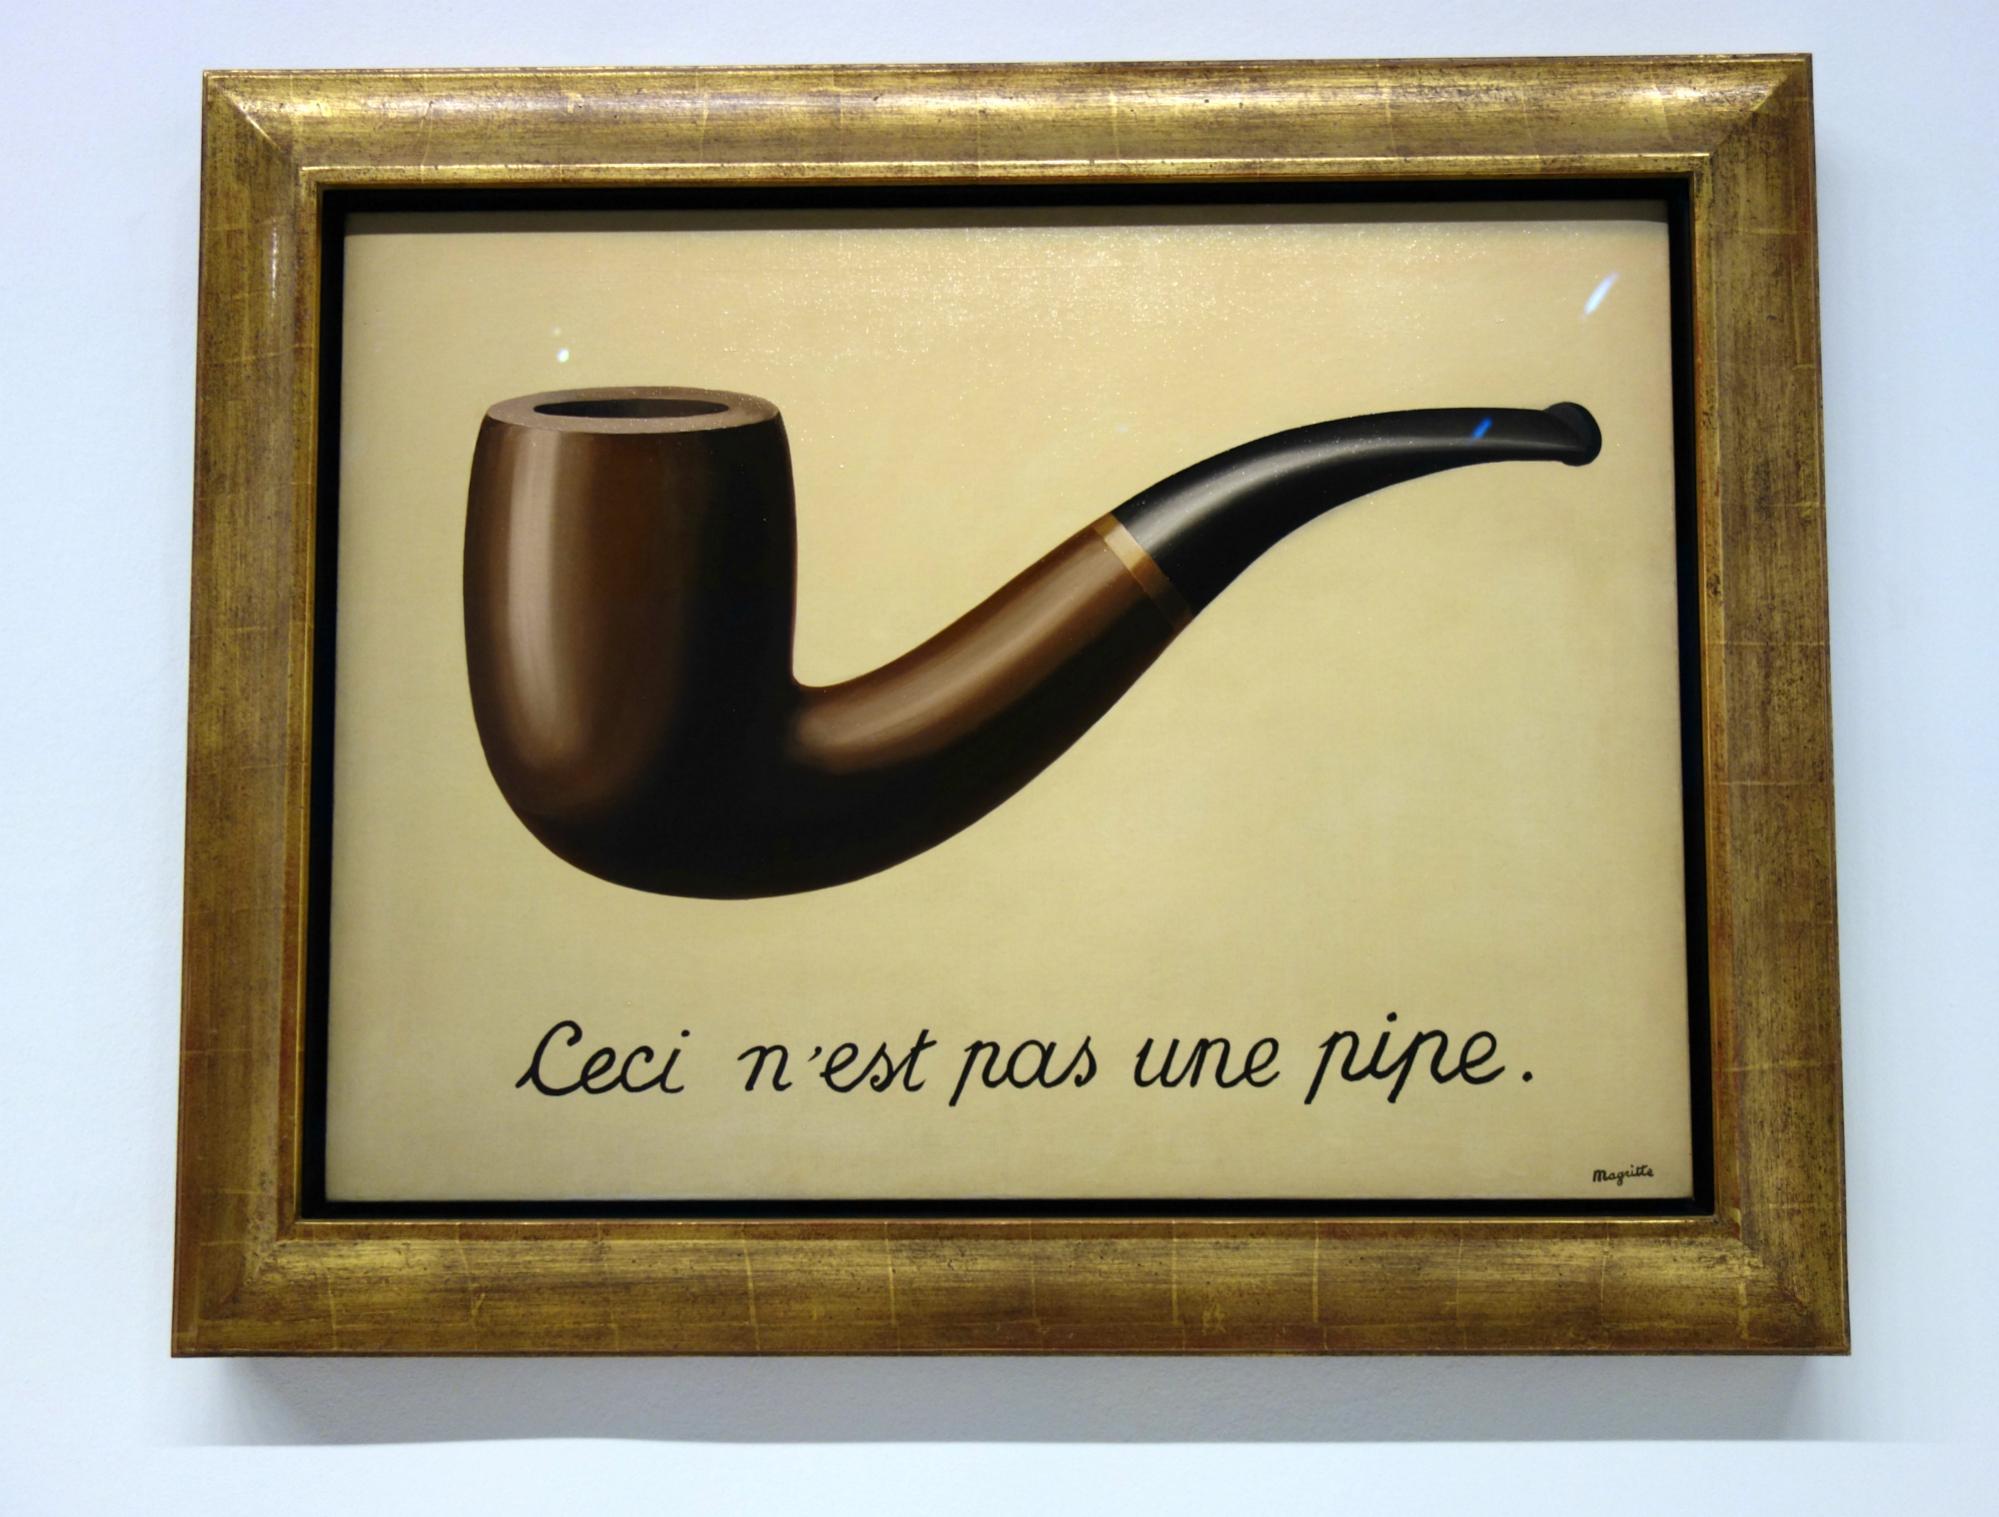 Name:  The-treachery-of-images-Renée-Magritte-at-the-Pompidou-©Sylvia-DavisJPG.jpg Views: 167 Size:  236.5 קילובייט